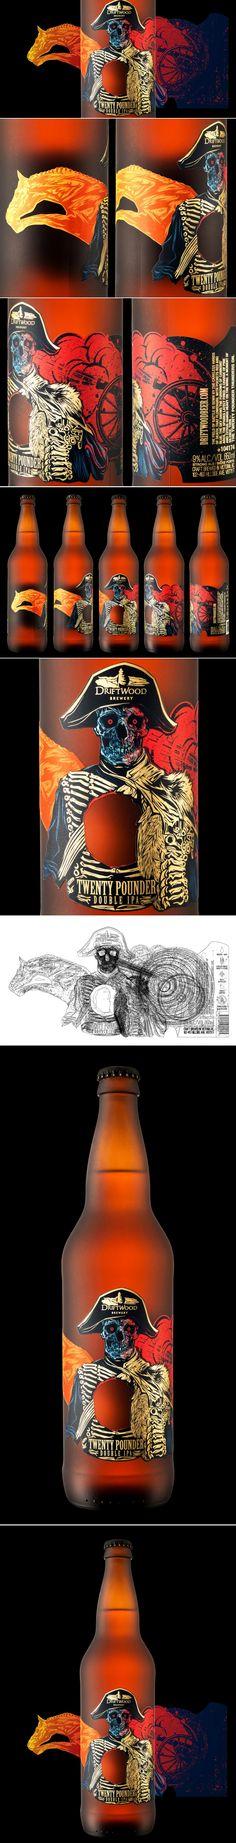 Twenty Pounder Double IPA — The Dieline | Packaging & Branding Design & Innovation News